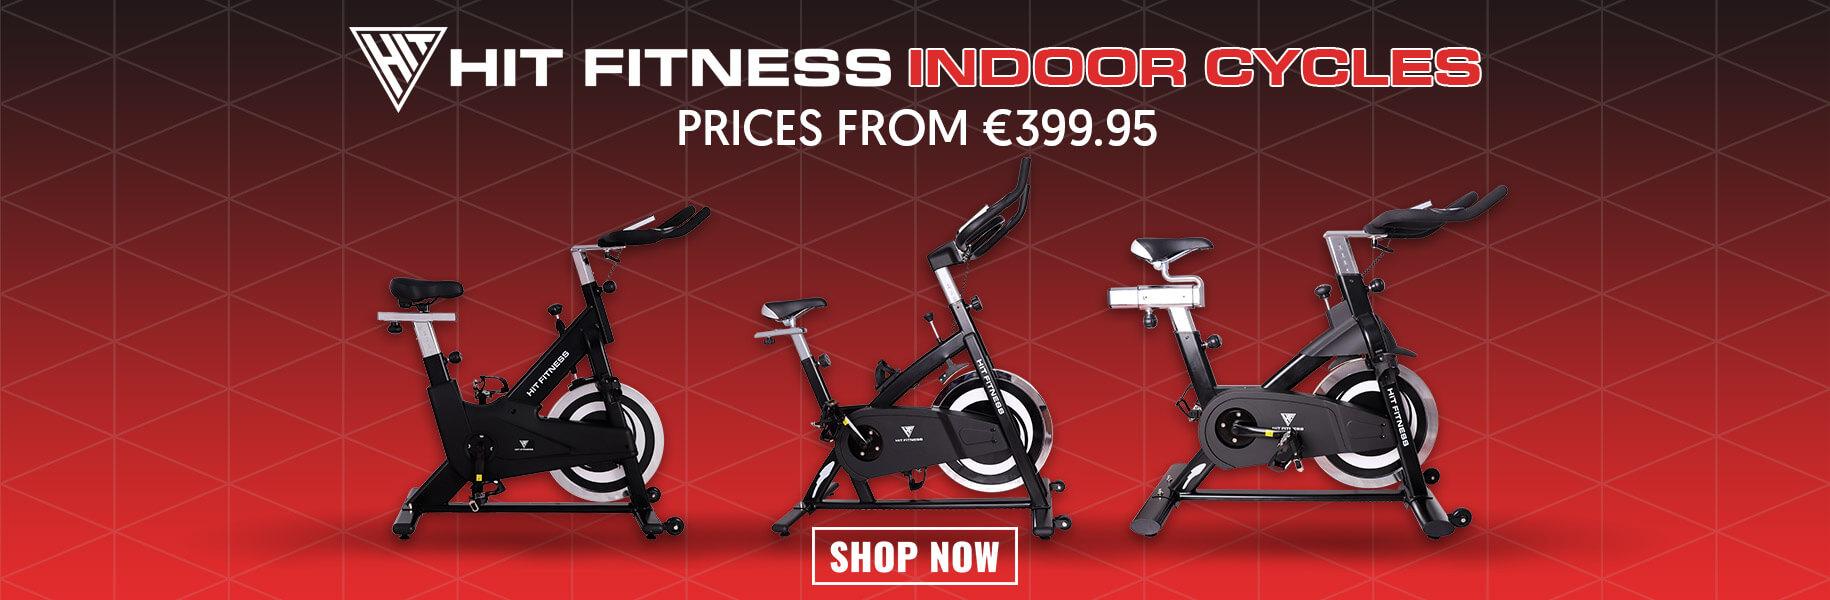 Exercise Bikes Image